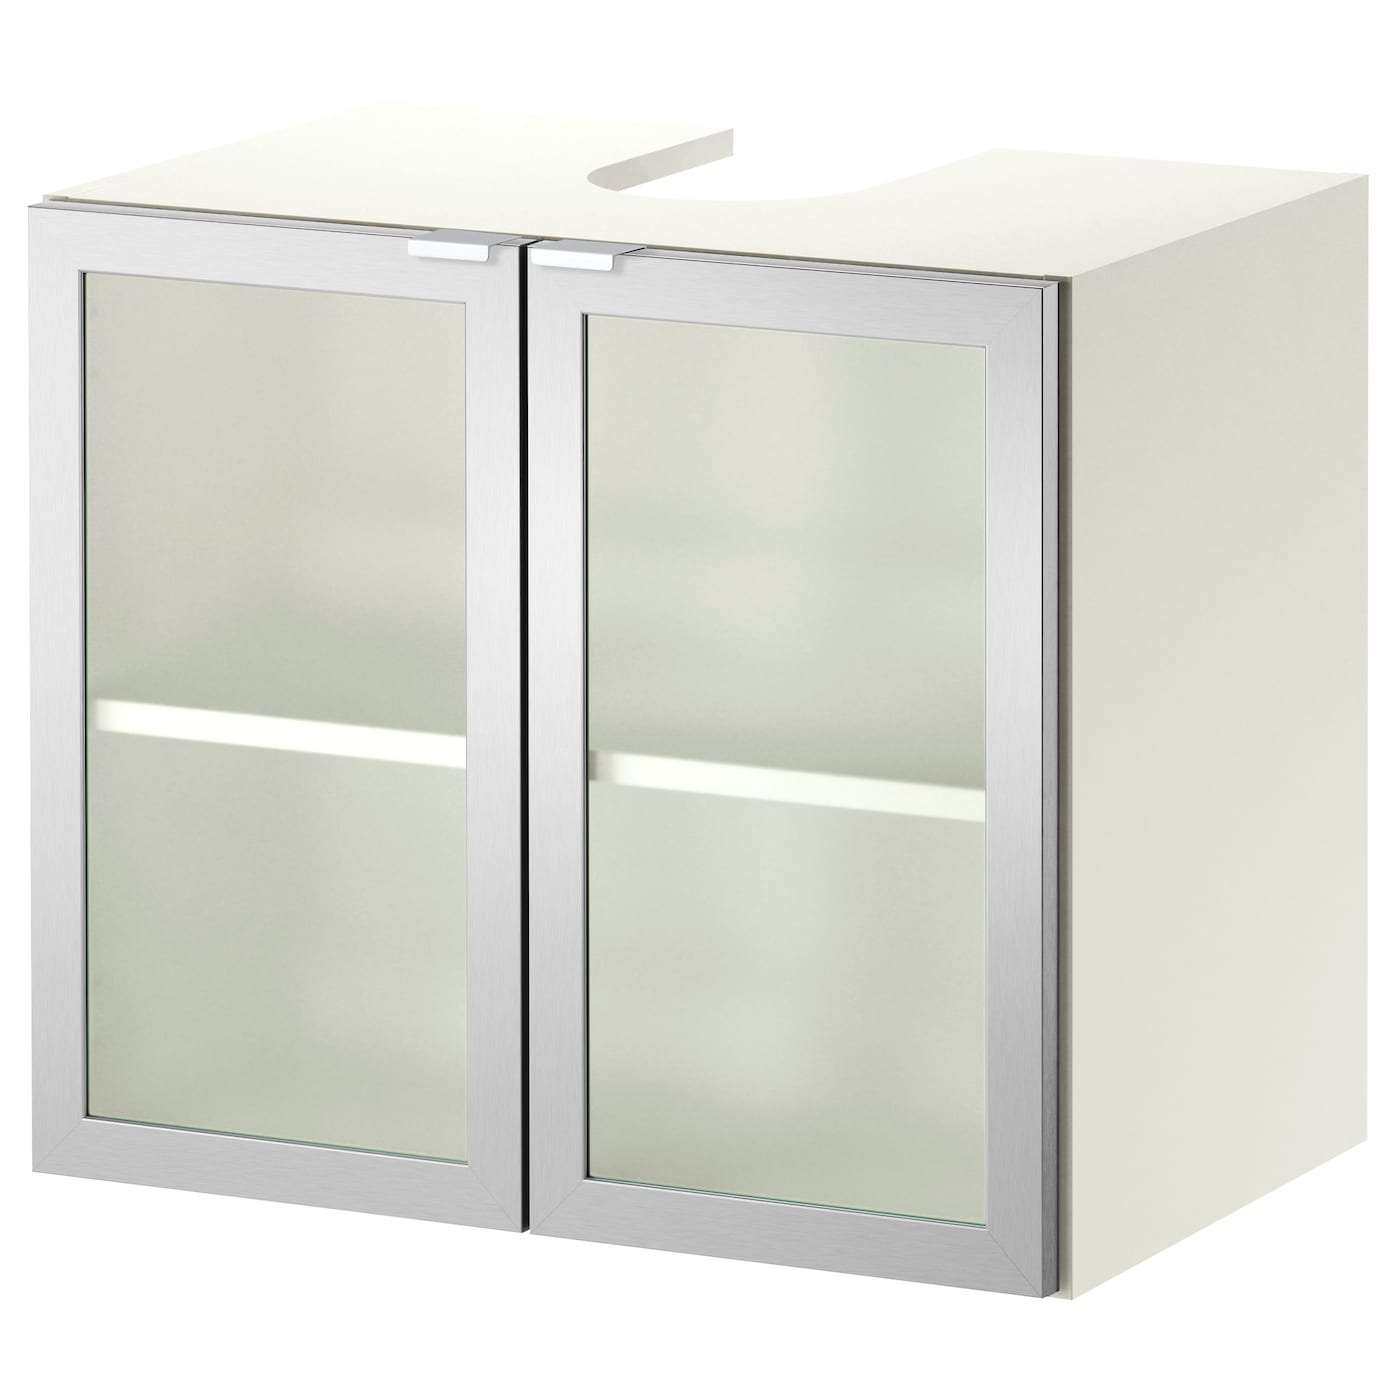 lill ngen l ment bas lavabo 2 portes blanc aluminium. Black Bedroom Furniture Sets. Home Design Ideas